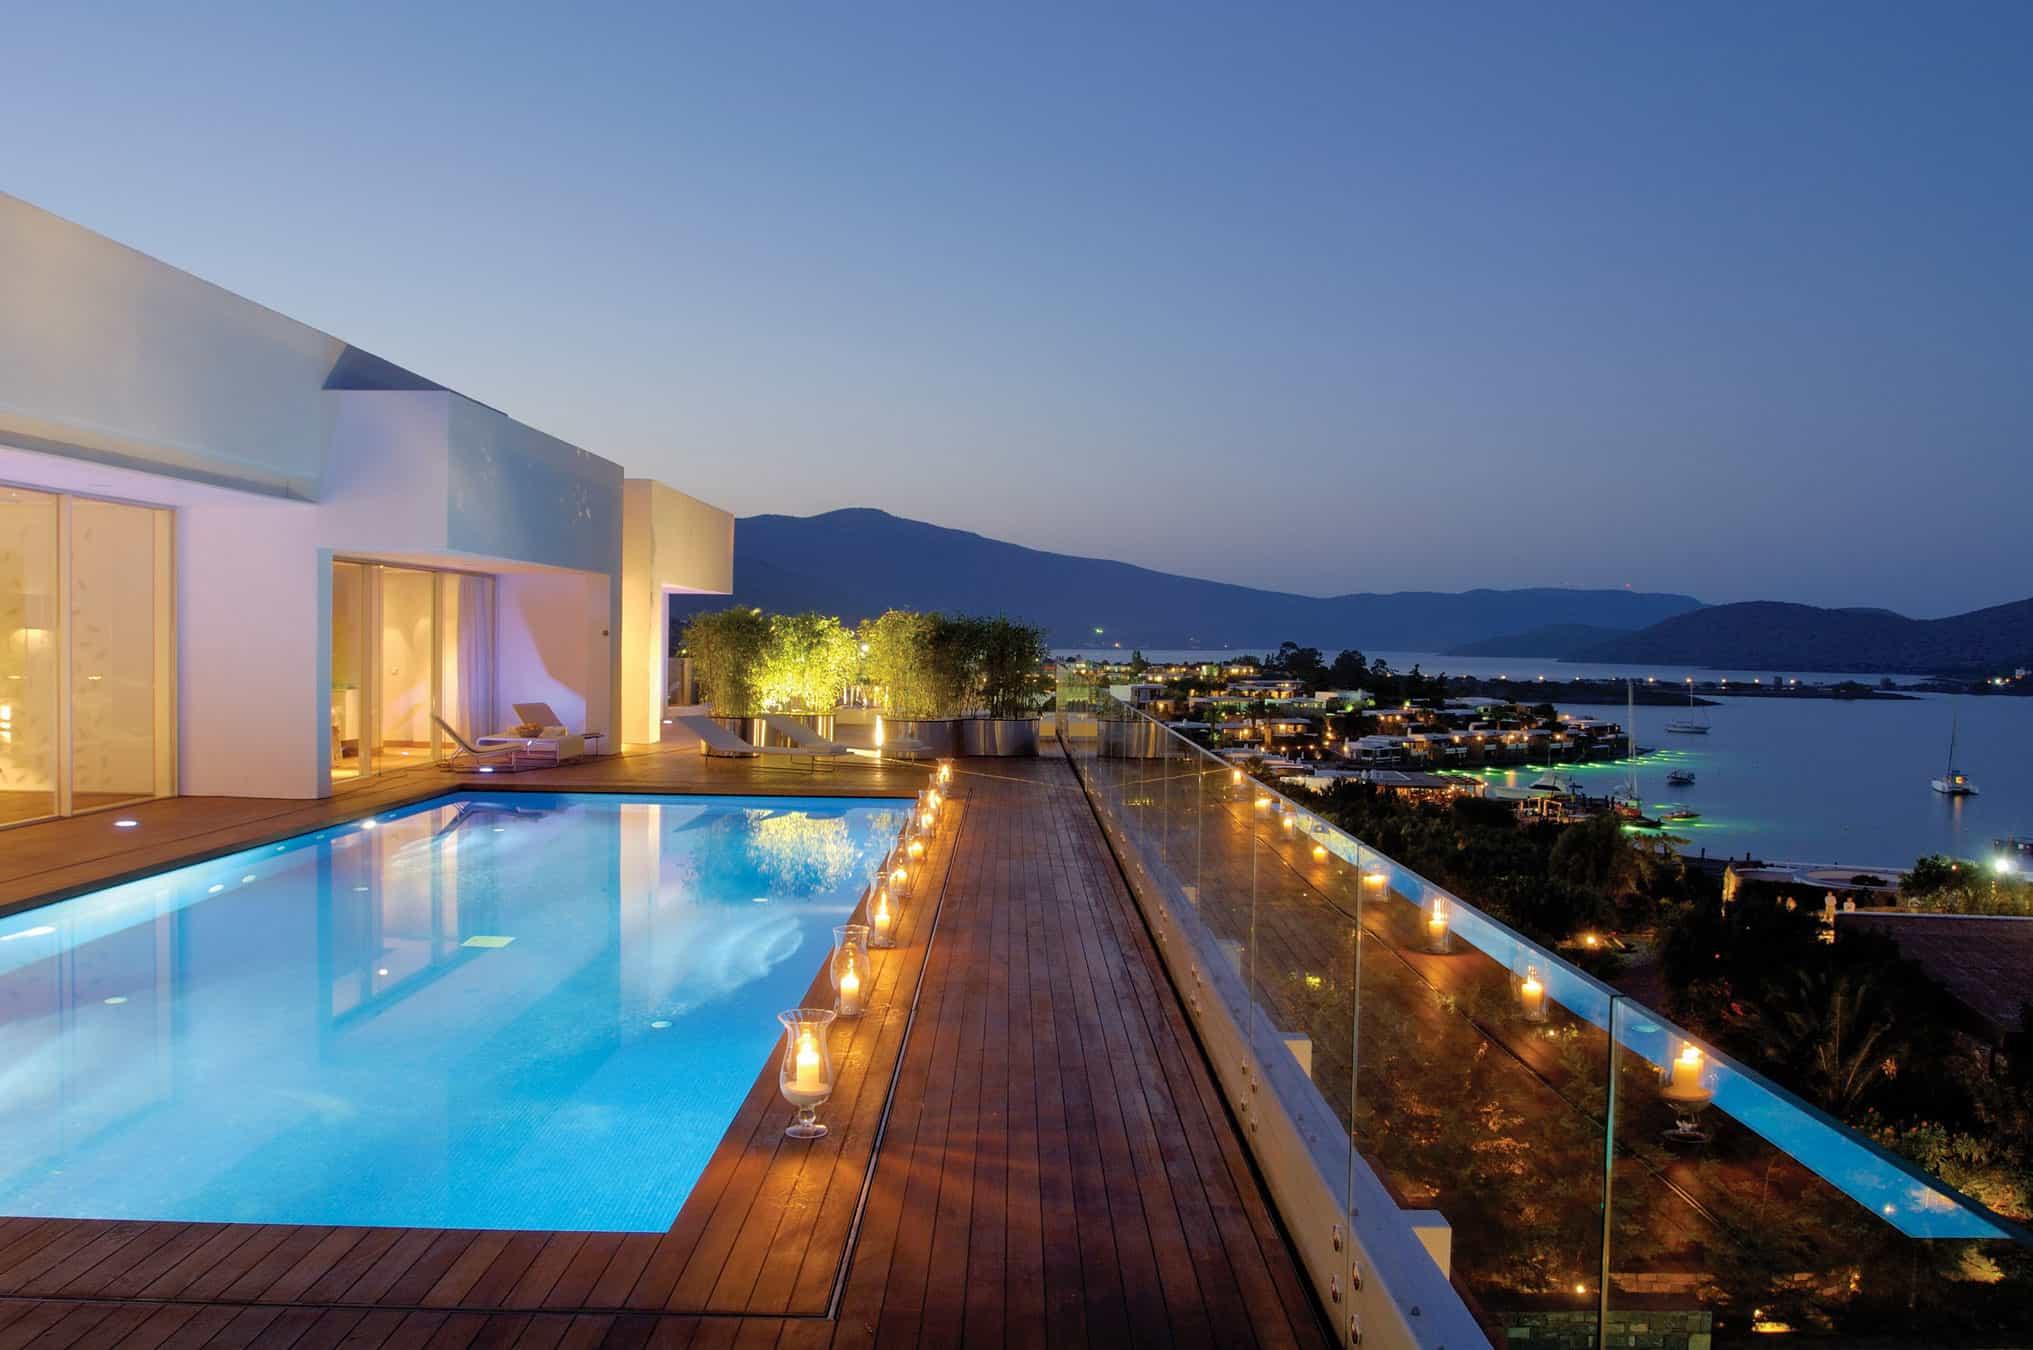 Yachting Club Villas at Elounda Beach by Davide Macullo Architects